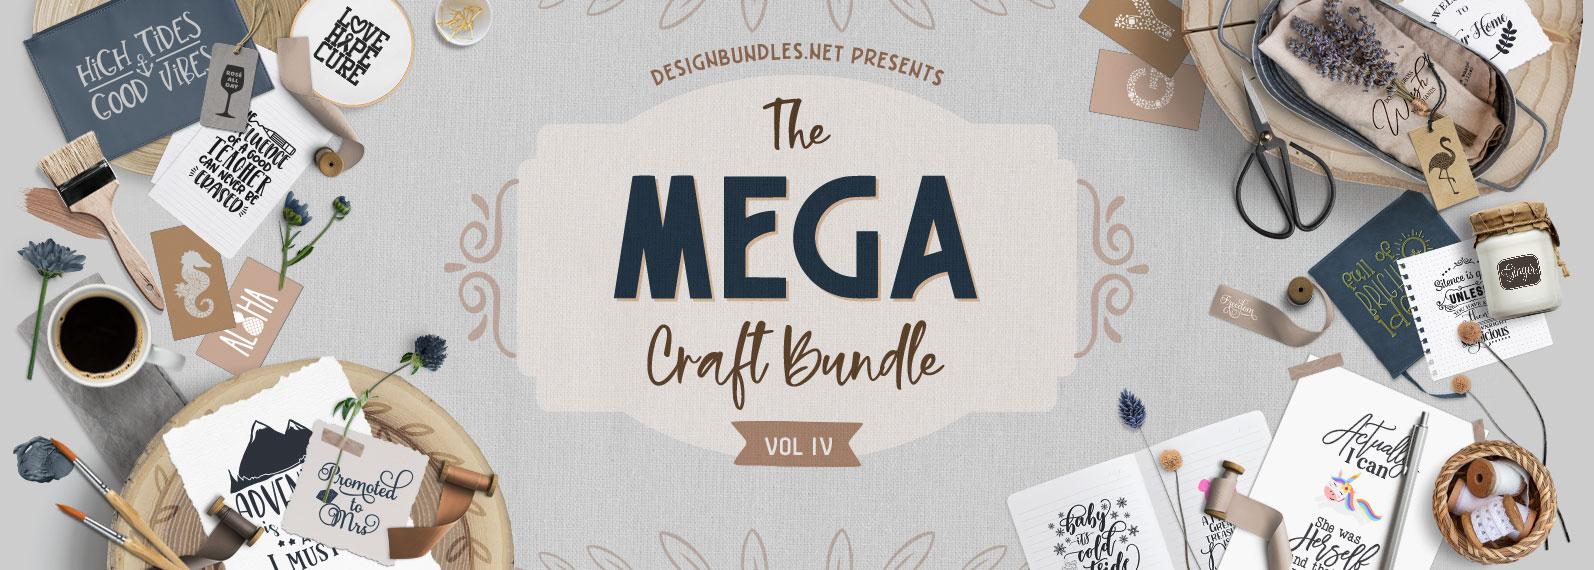 The Mega Craft Bundle IV